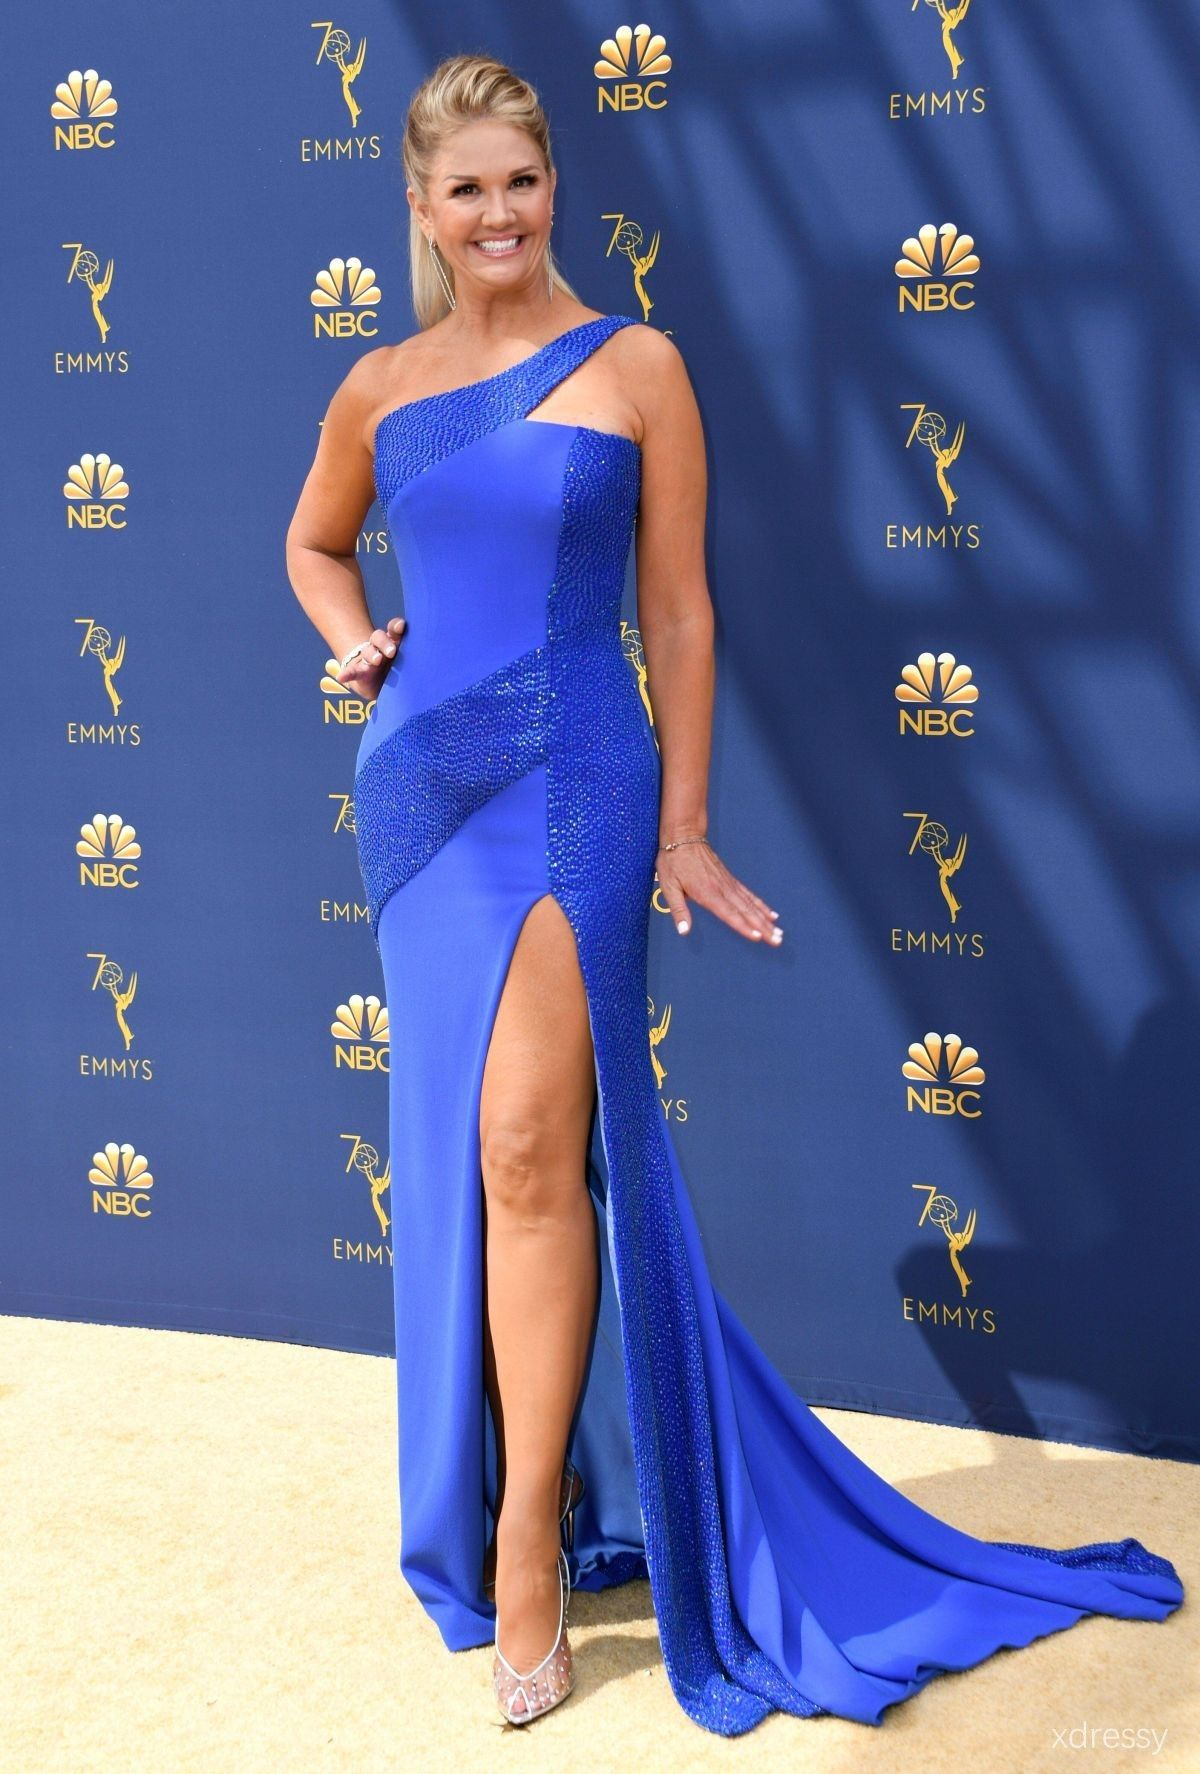 2af6ec43ab Nancy O Dell Asymmetrical Single Shoulder Strap Beaded Royal Blue  Thigh-high Slit Prom Dress Emmys 2018 Red Carpet